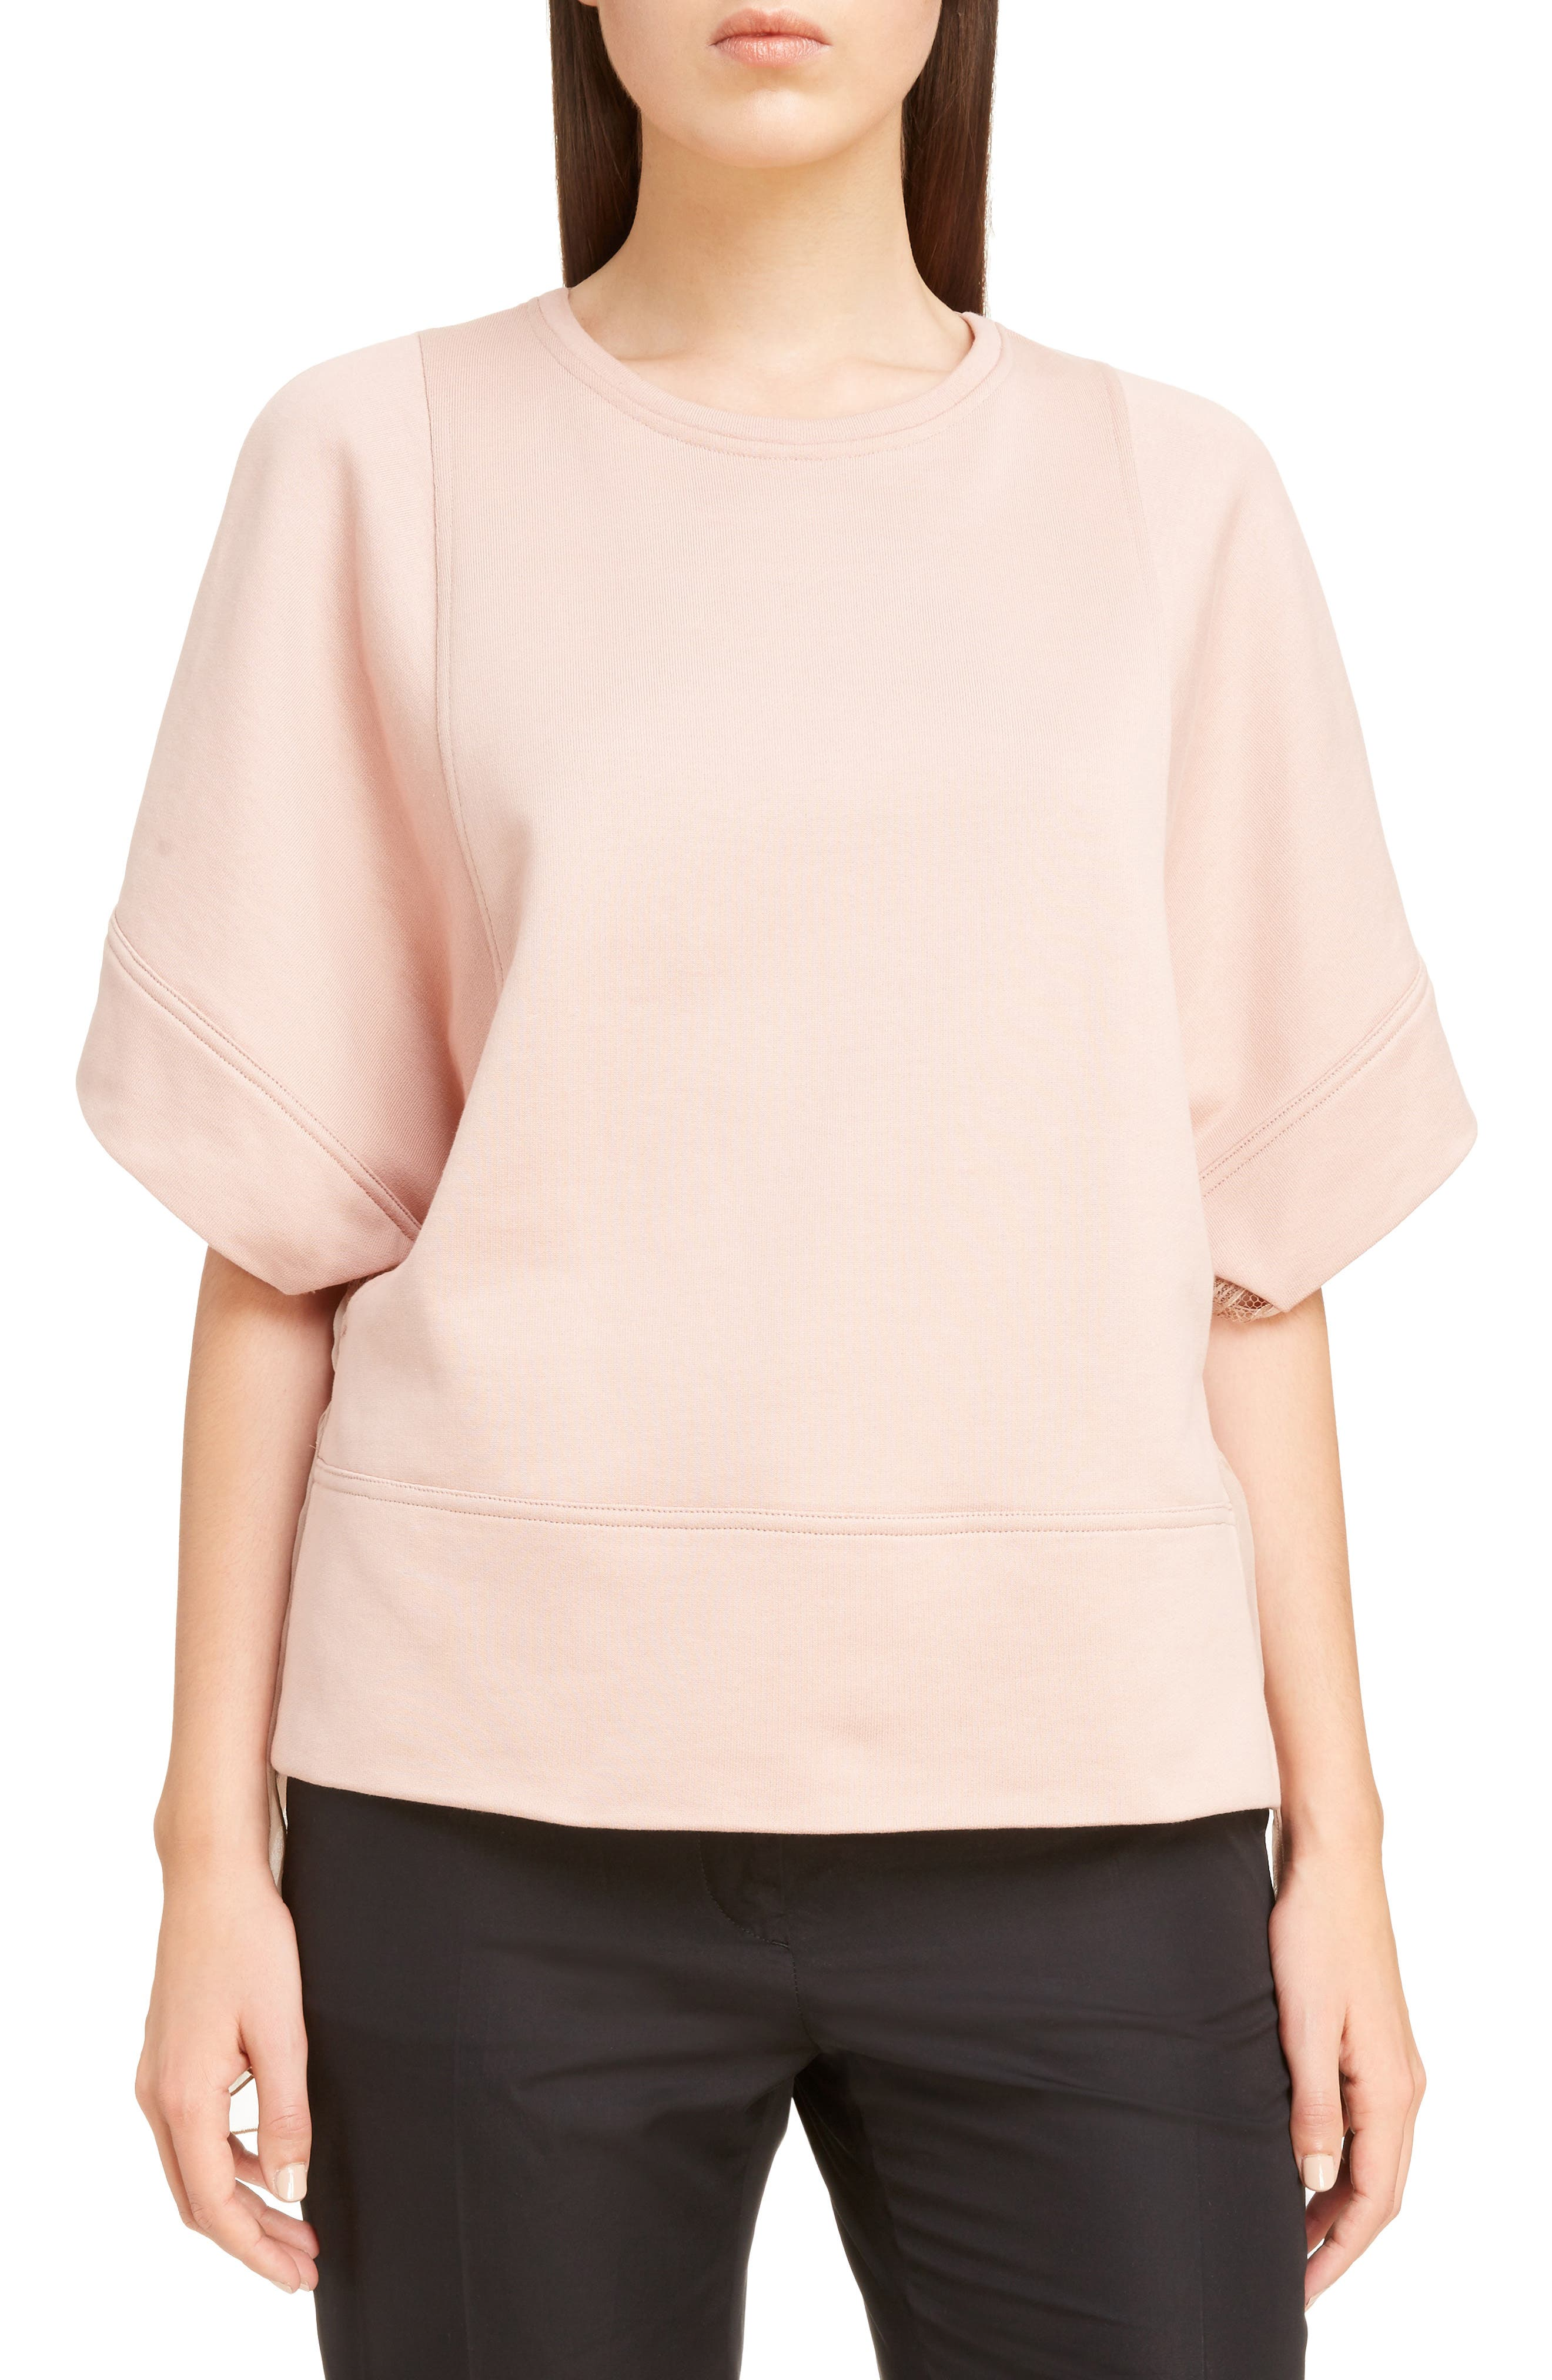 Nº21 Chiffon Back Sweatshirt,                         Main,                         color, 650